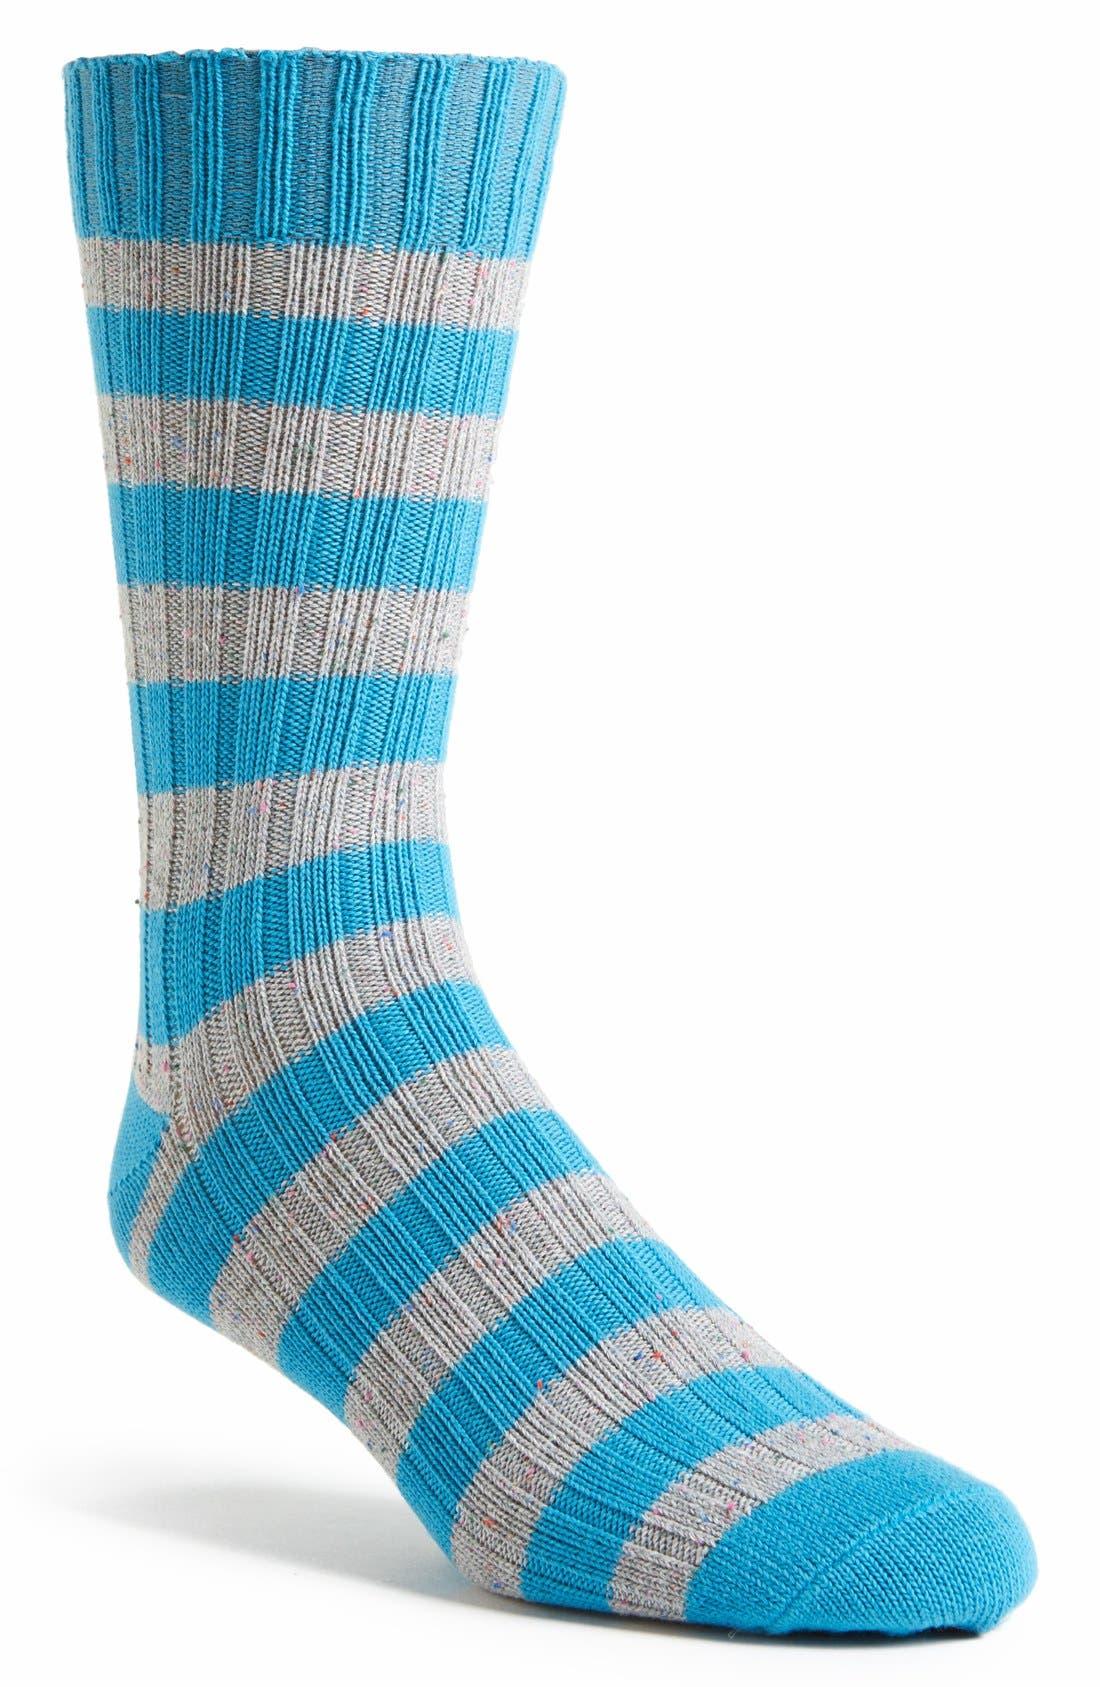 Main Image - PACT 'Confetti Stripe' Socks